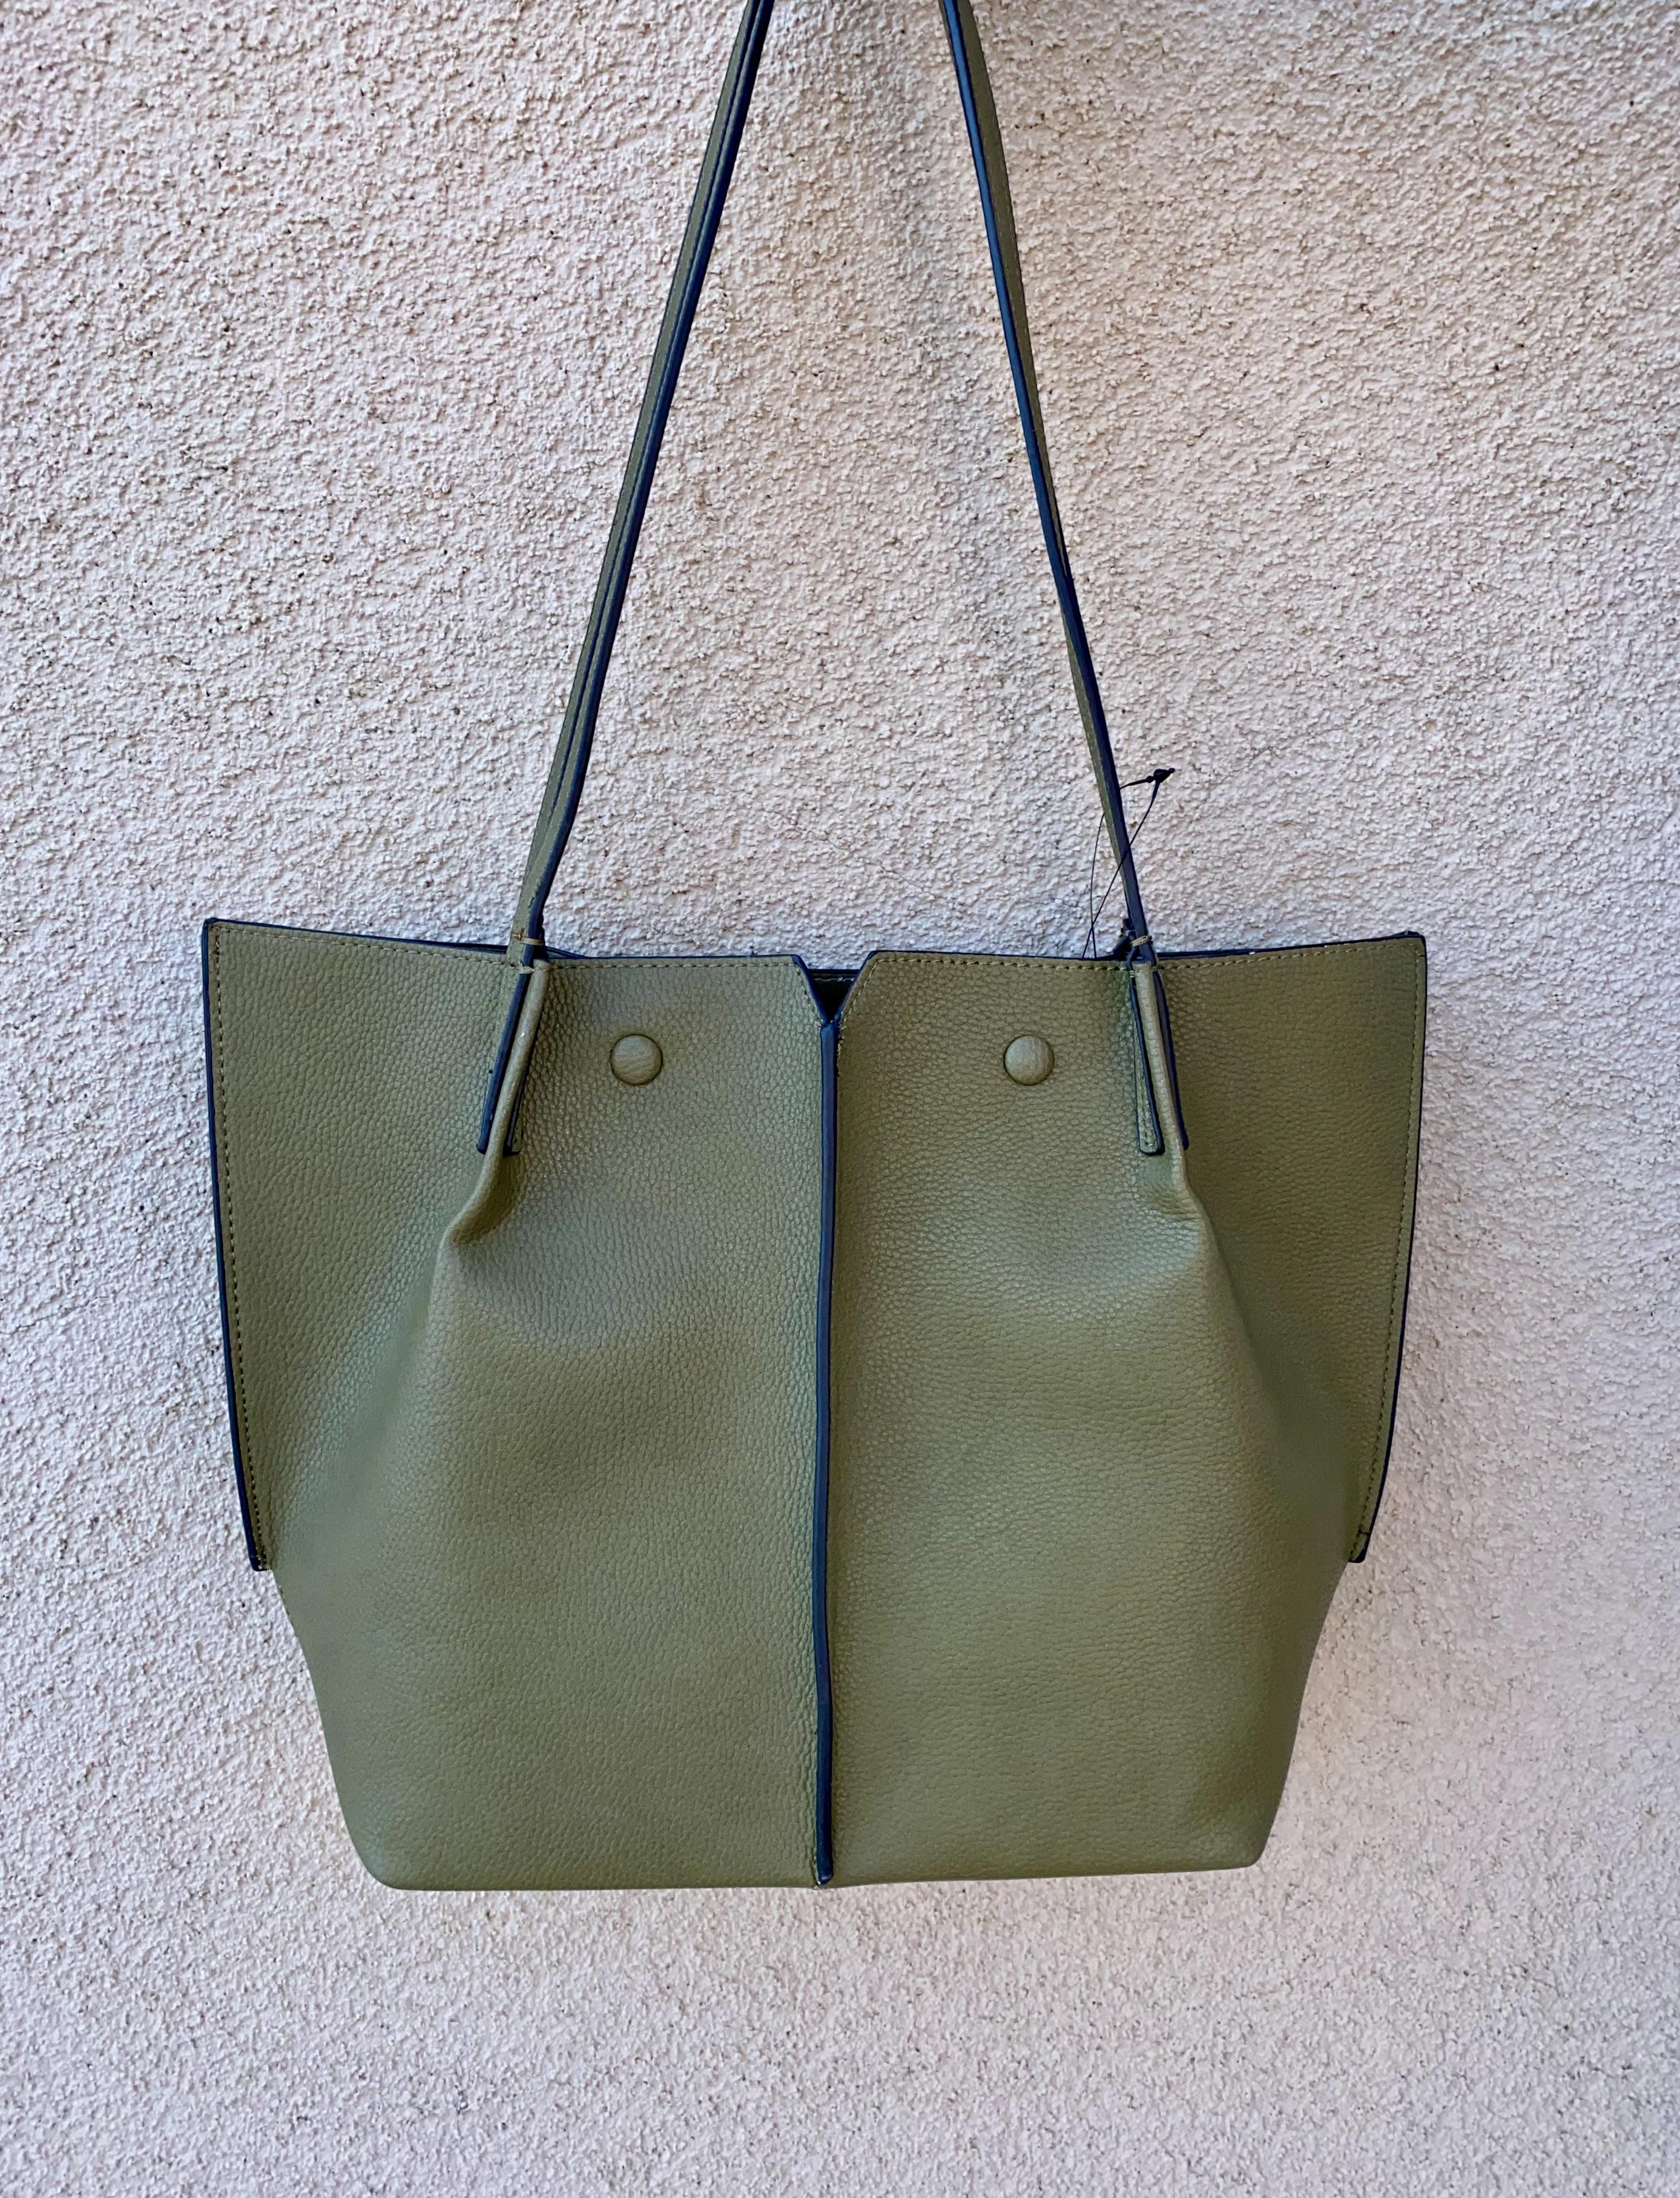 SRSR bag $79